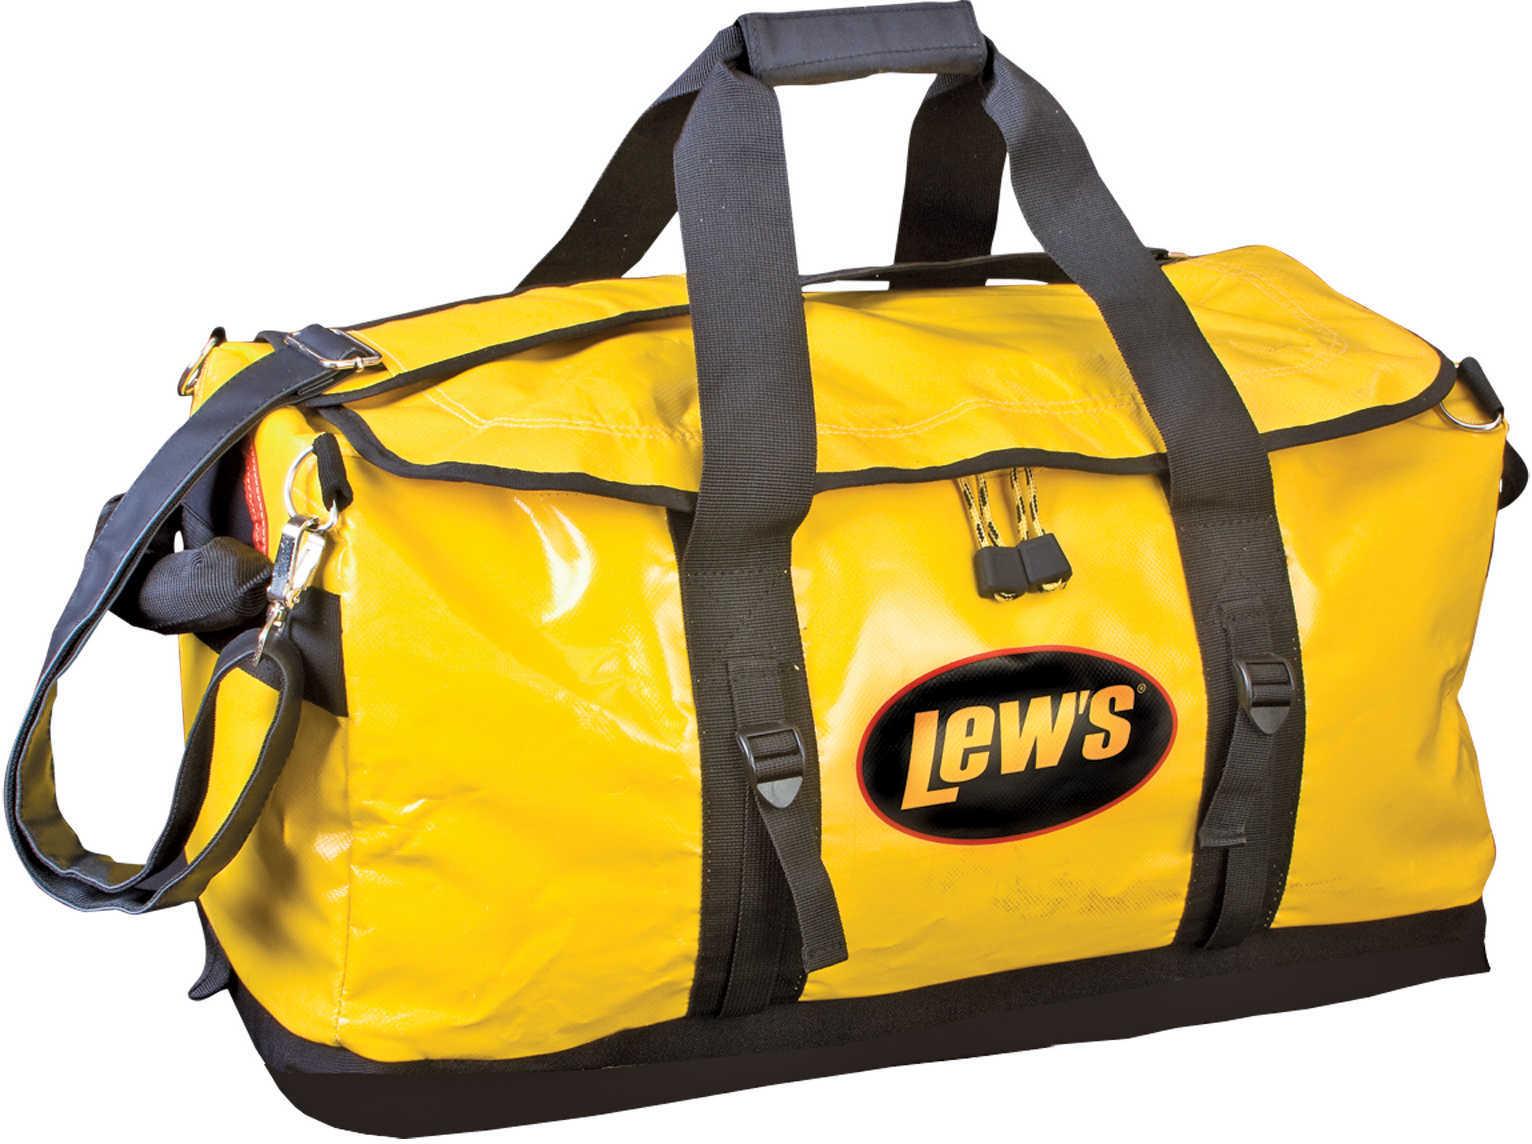 "Lew'S Speed Boat Bag, Yellow/Black, 24"" Md: B241212"